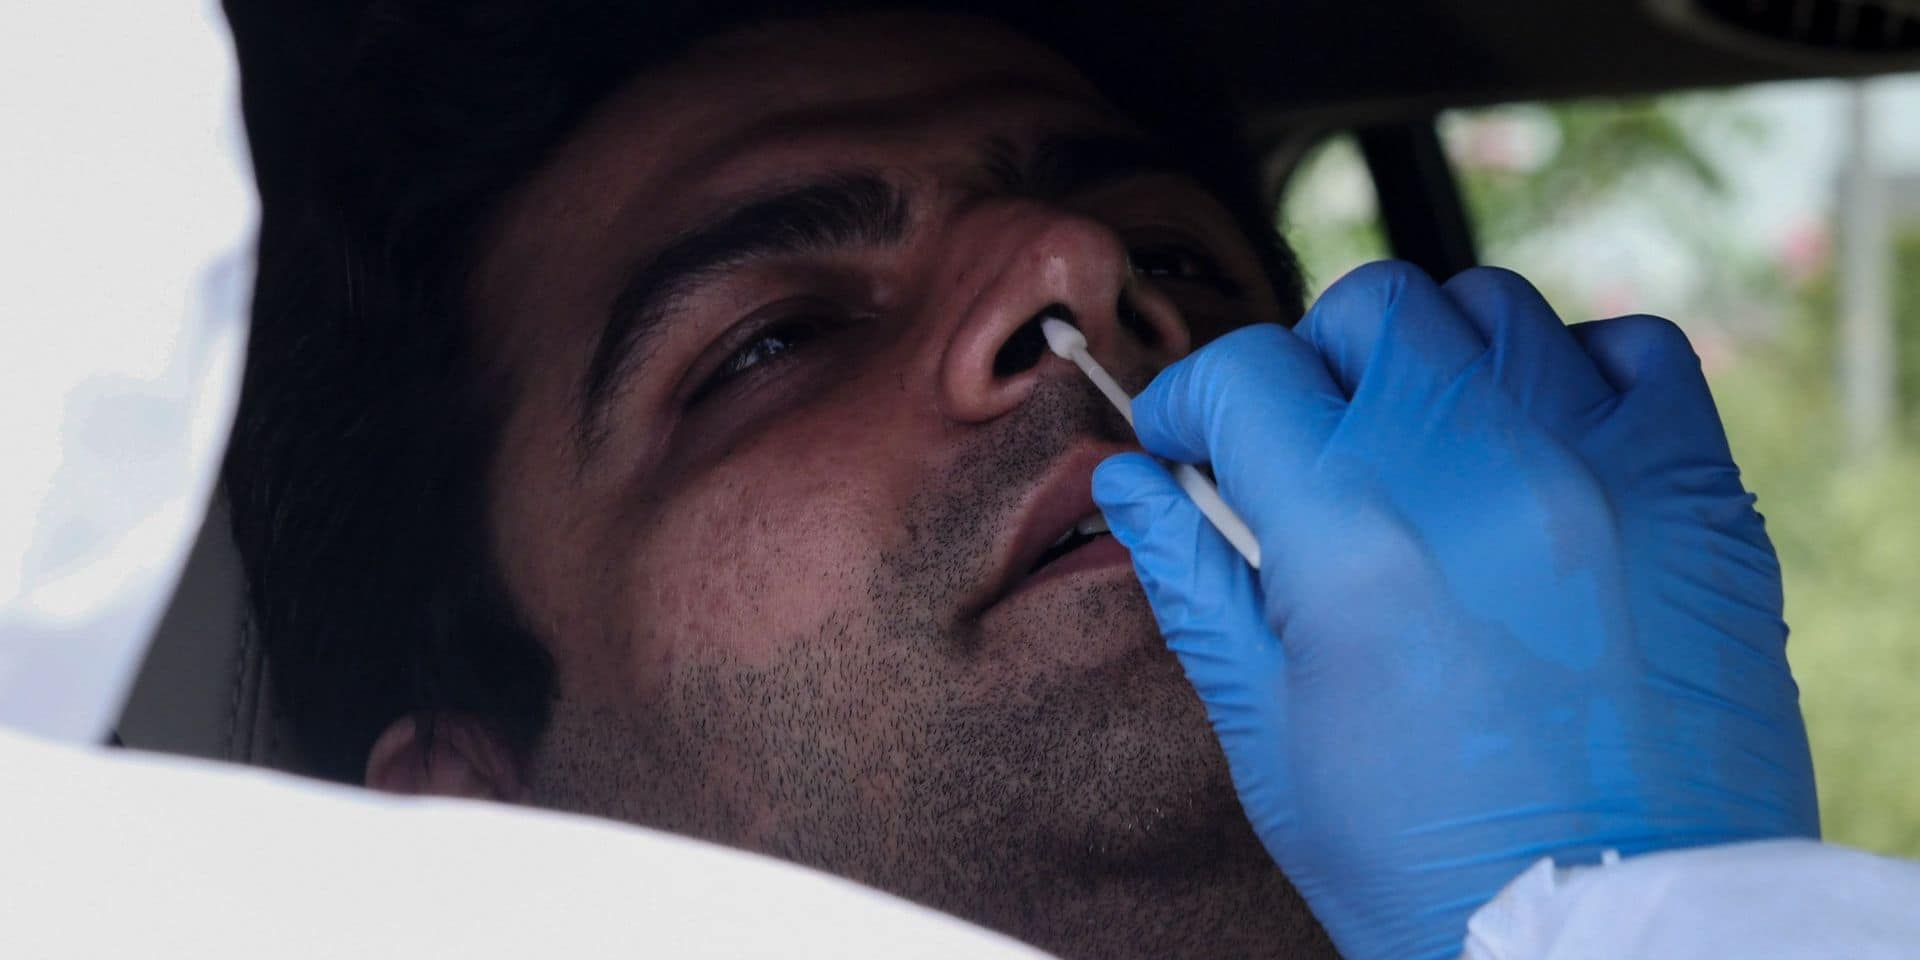 Test Covid 19 : Priorité aux malades à Huy